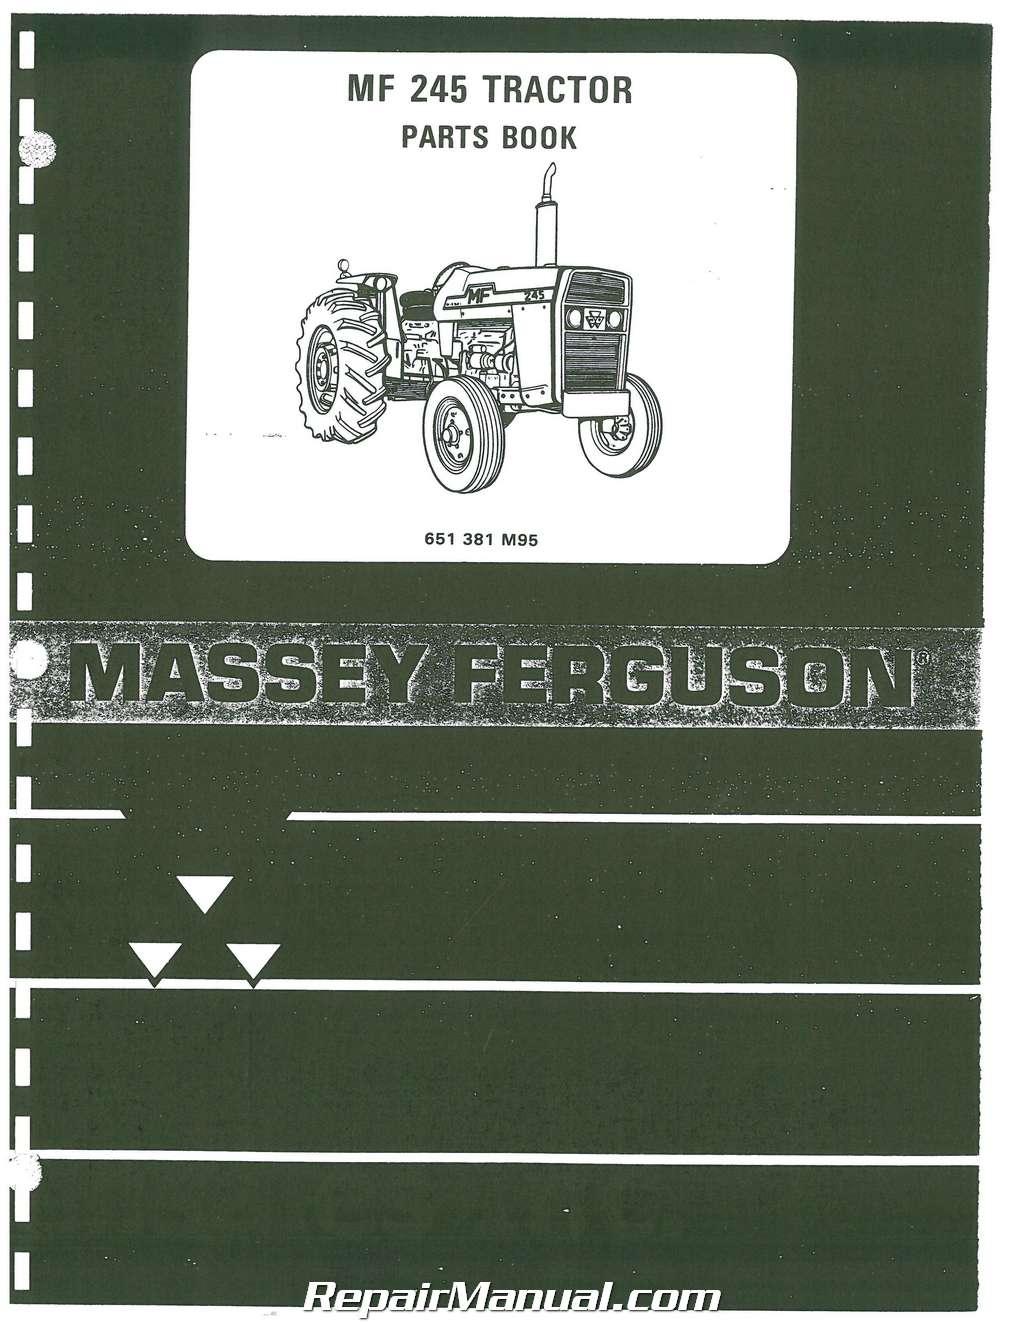 Massey Ferguson Part Numbers : Massey ferguson parts manual